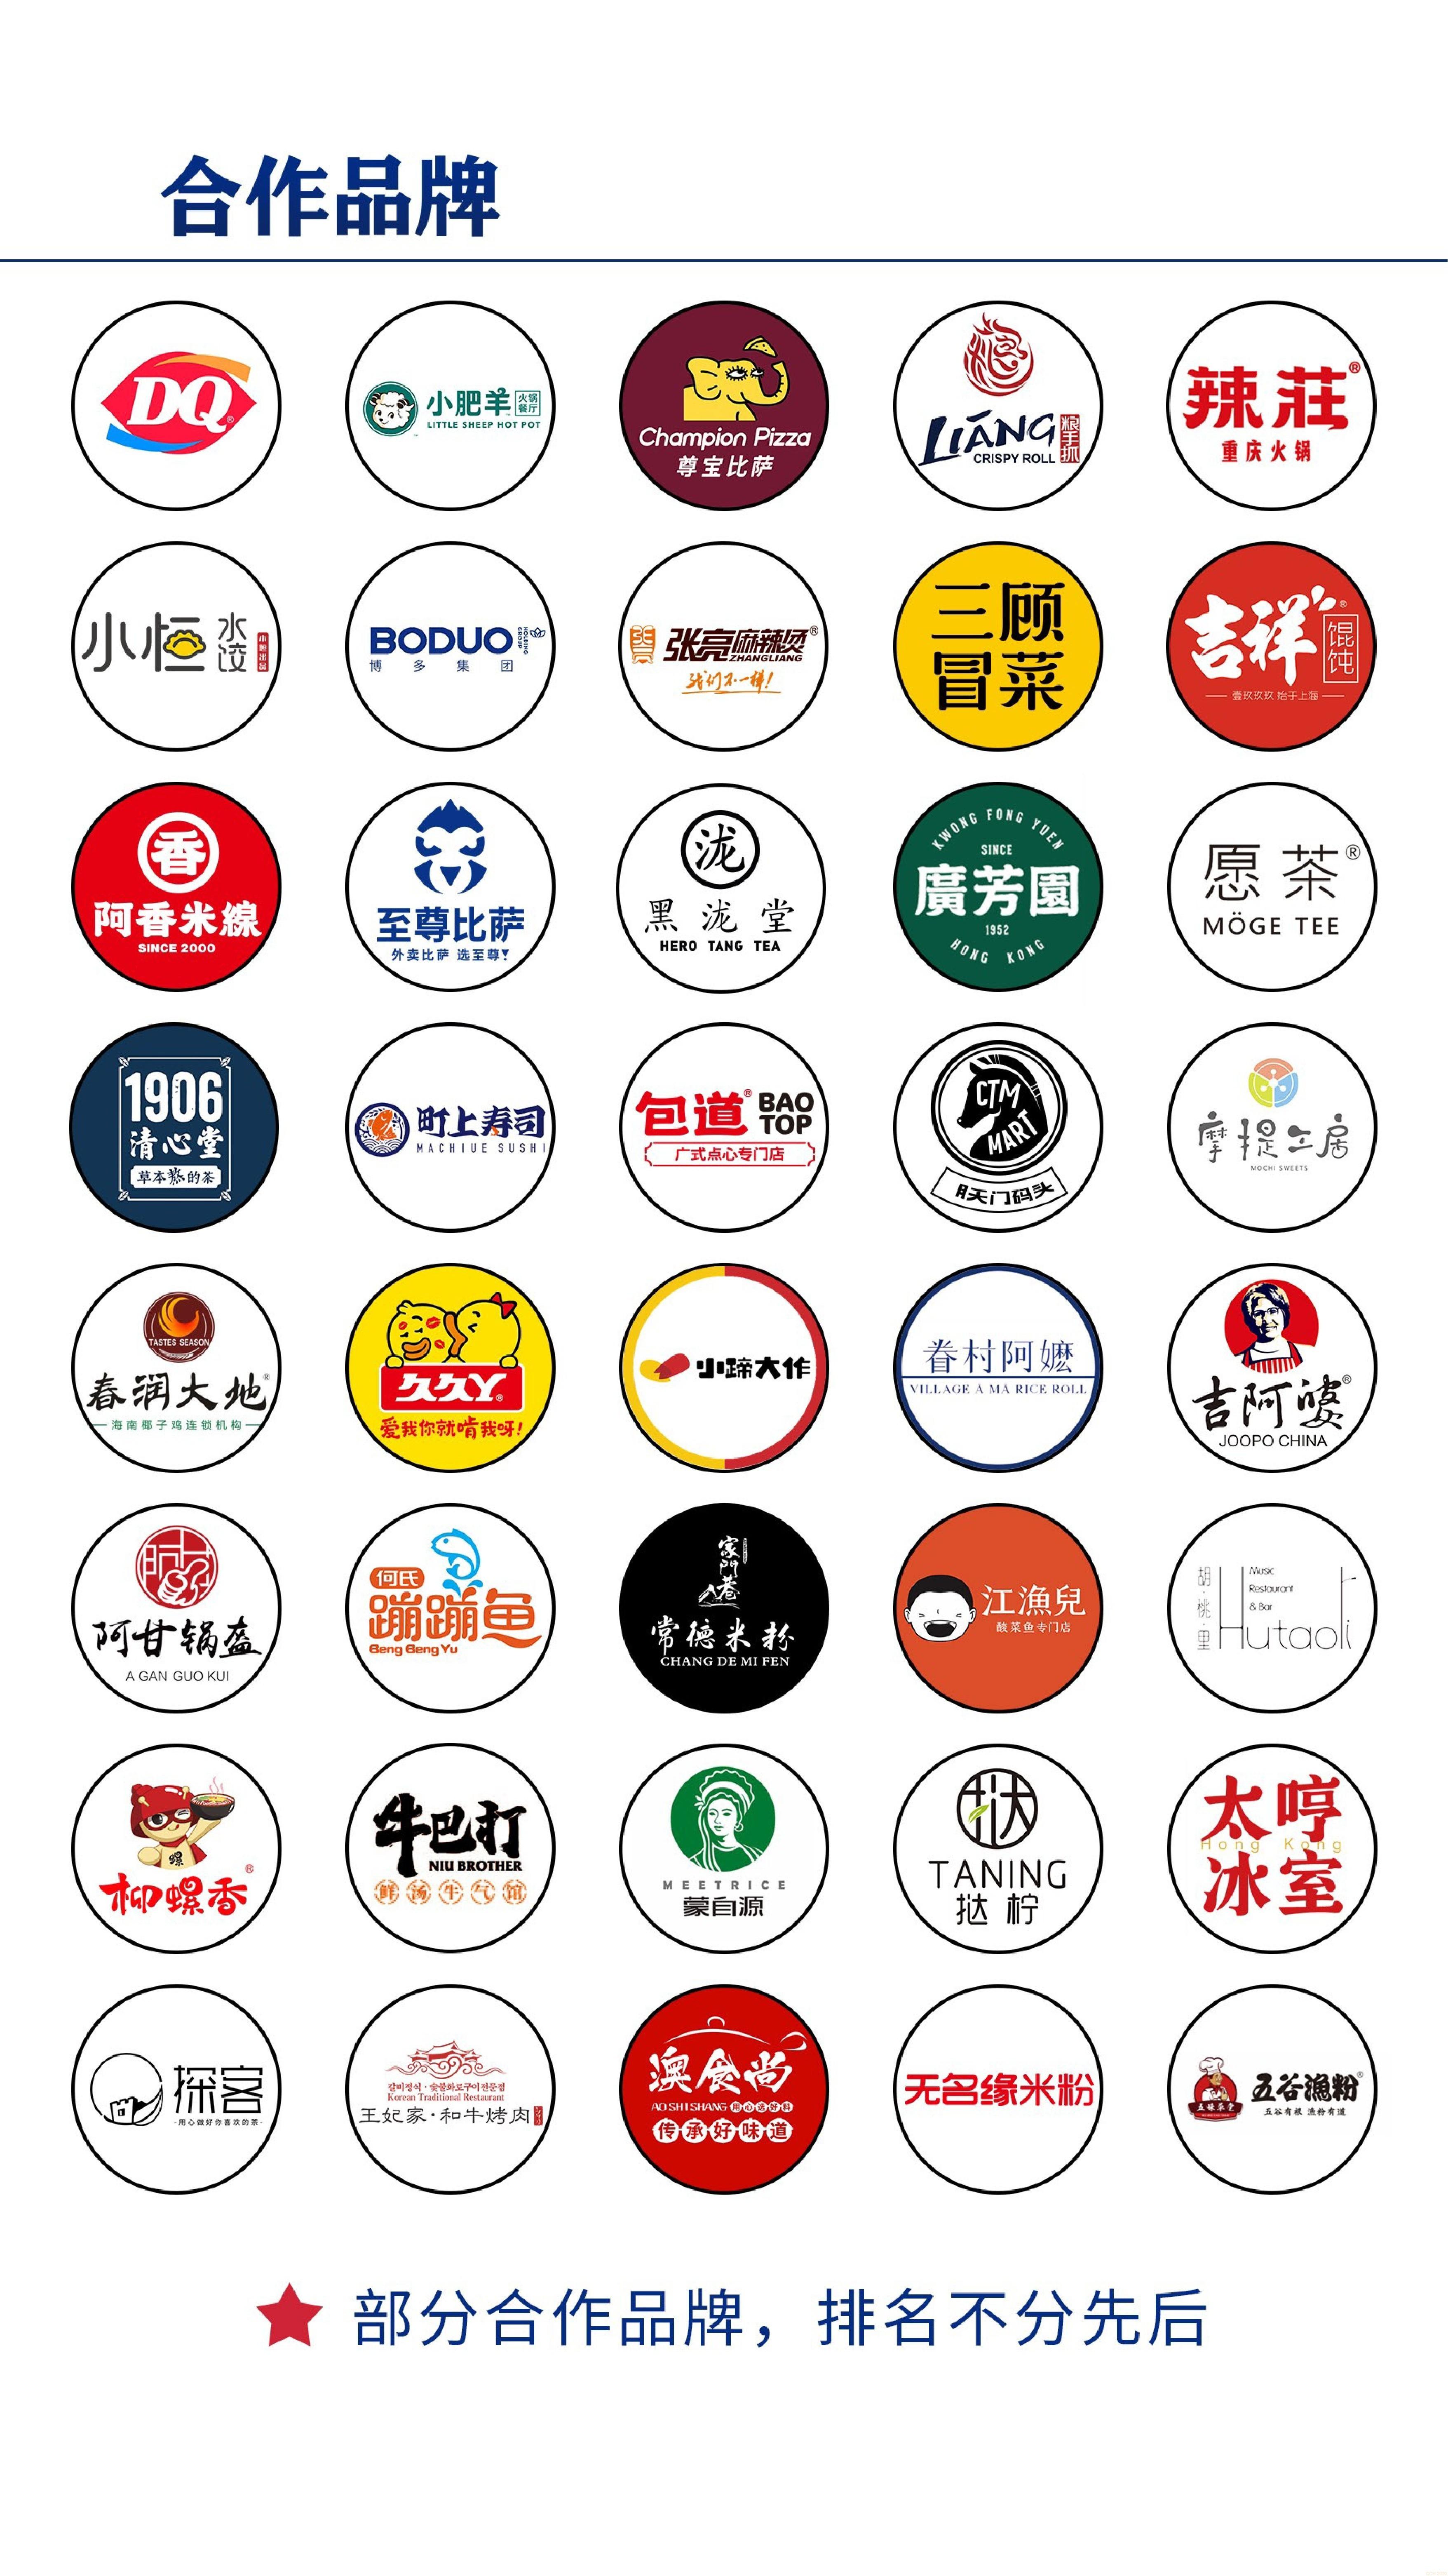 CCH2021-餐饮邀请函·赵(2)(1)-003.jpg